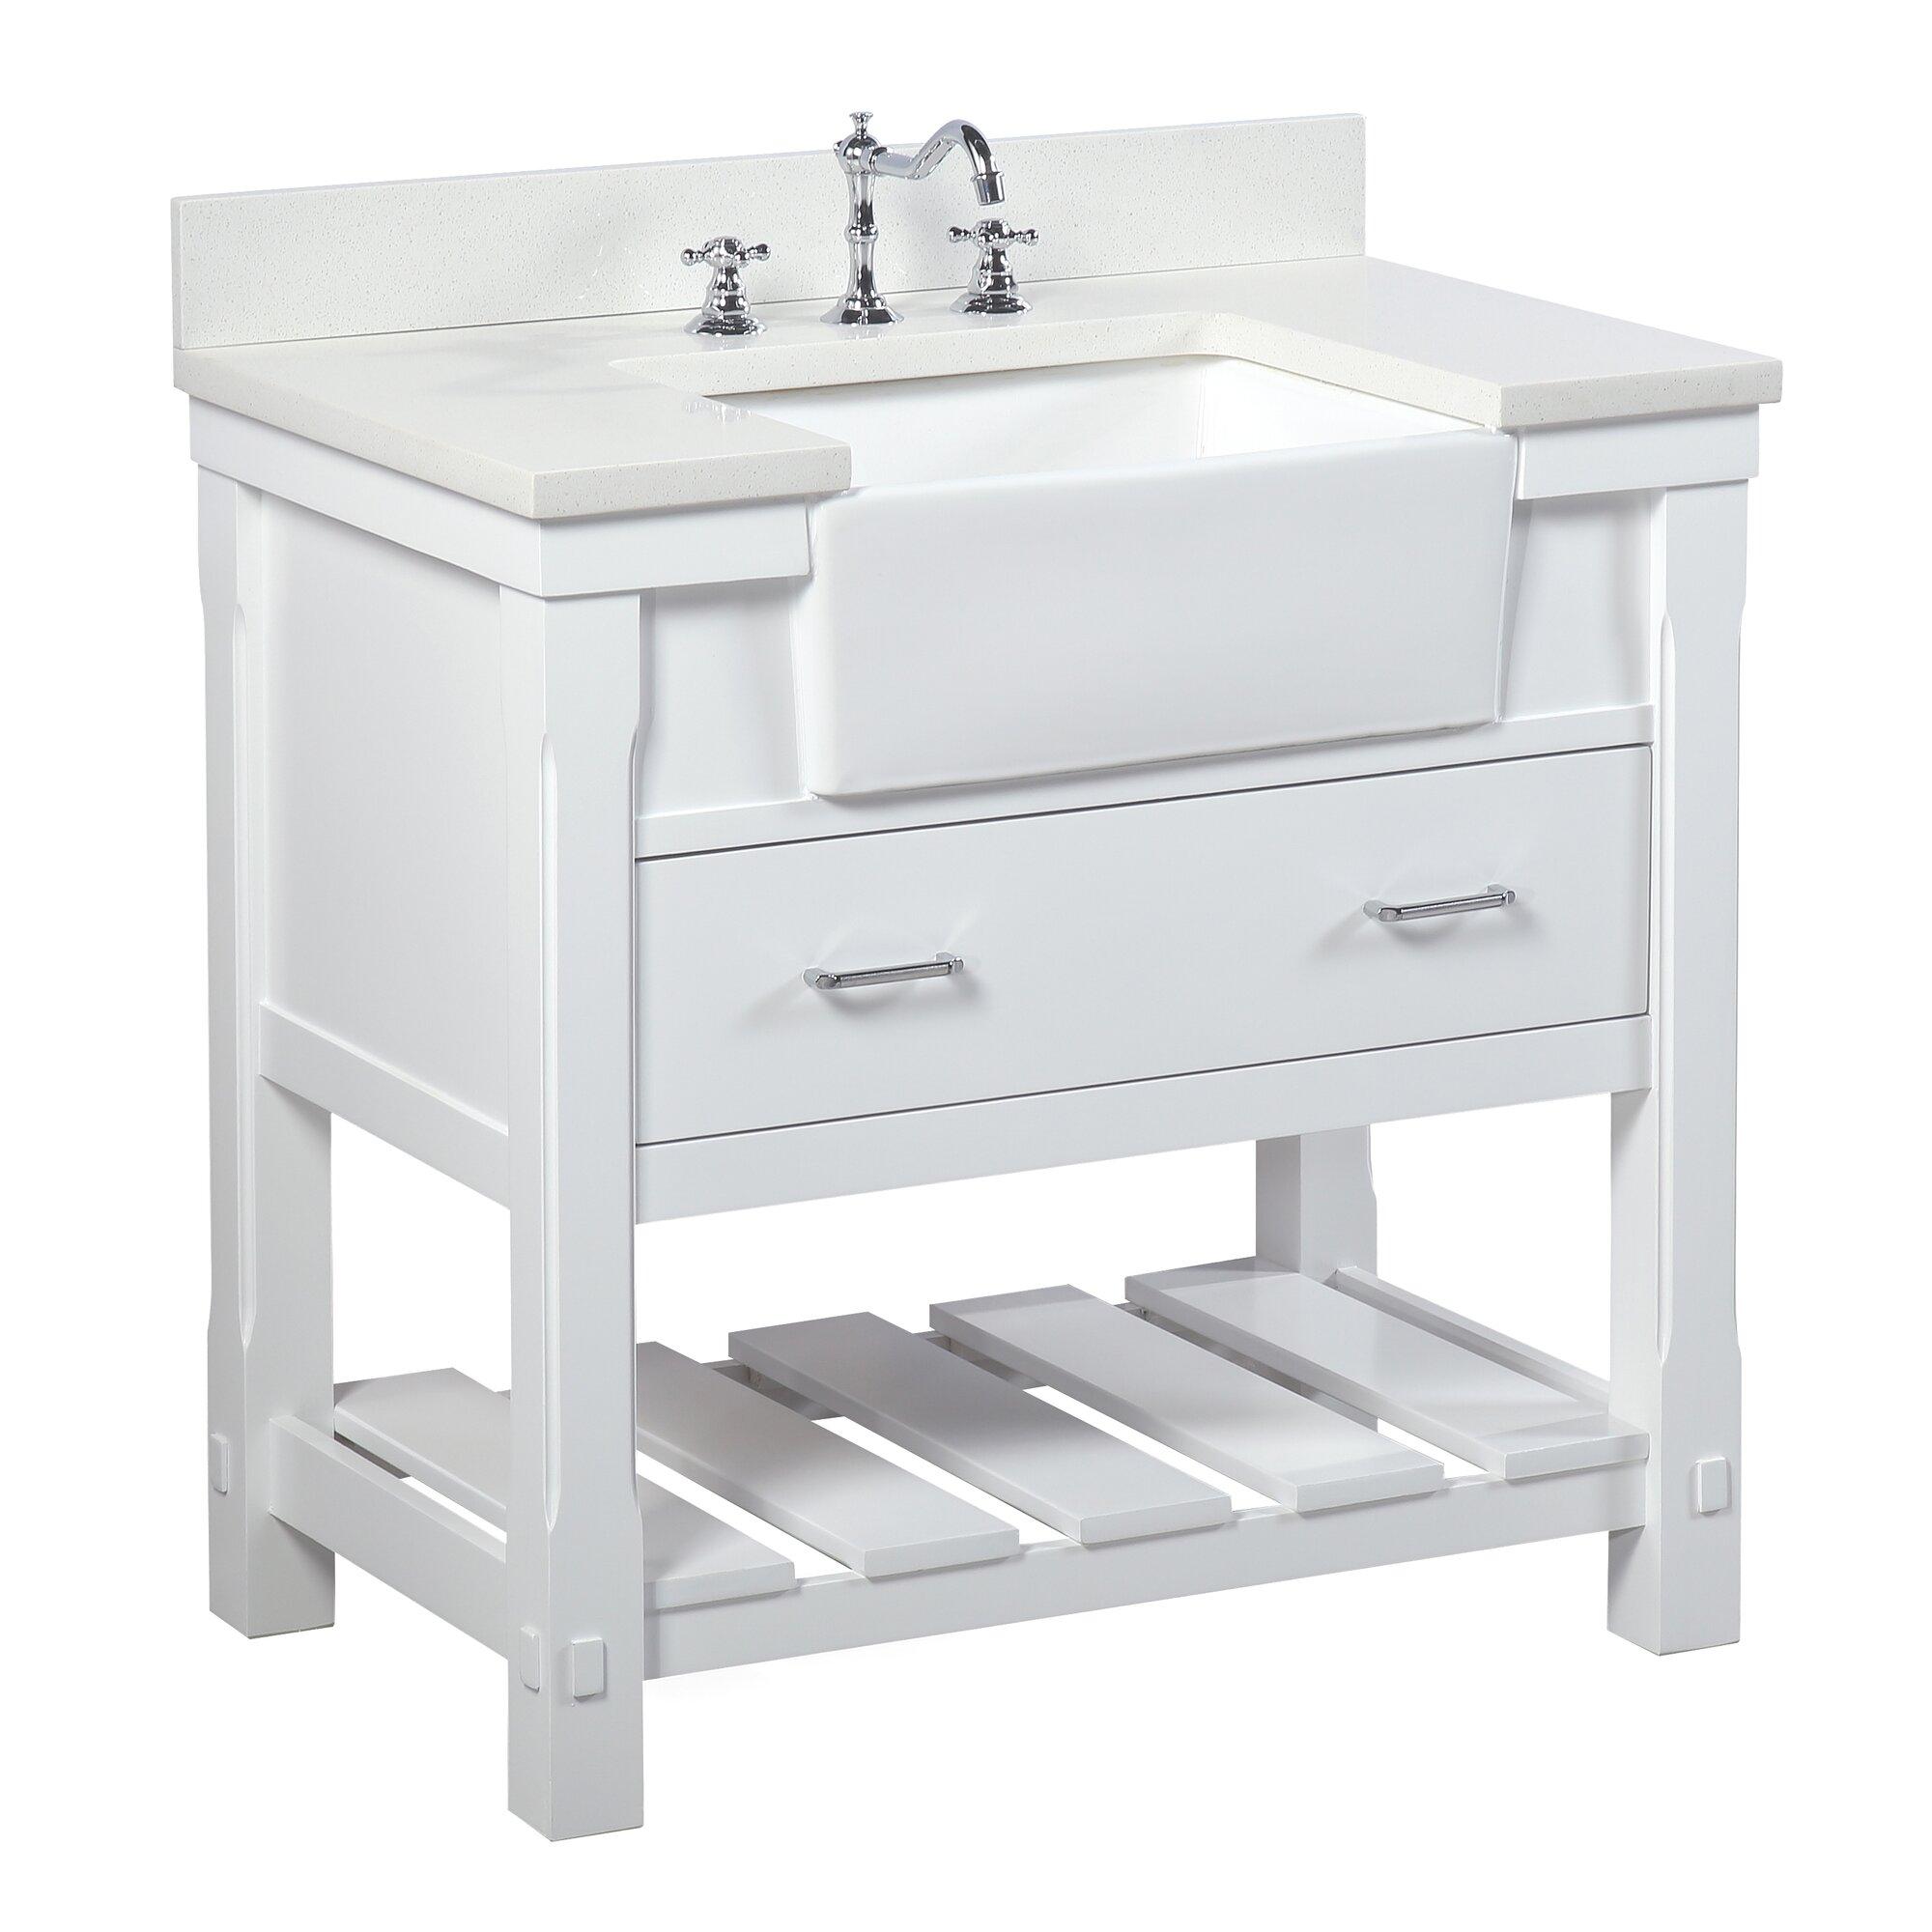 New Image Of Bathroom Vanities Charlotte Nc